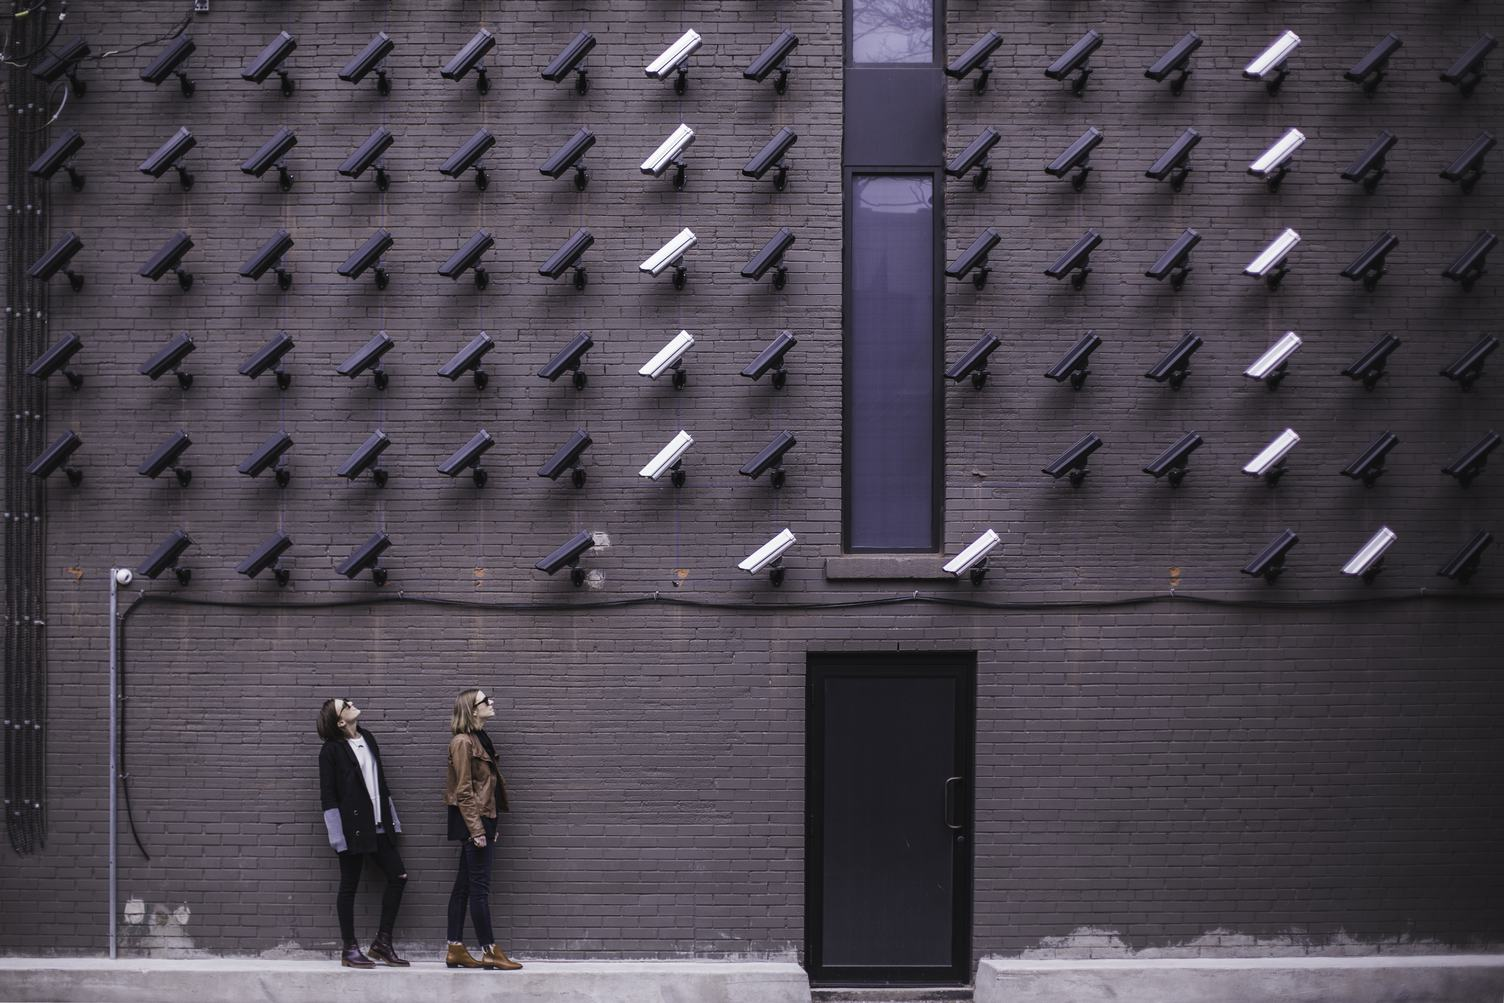 Many Surveillancs Cameras Keep an Eye on Women